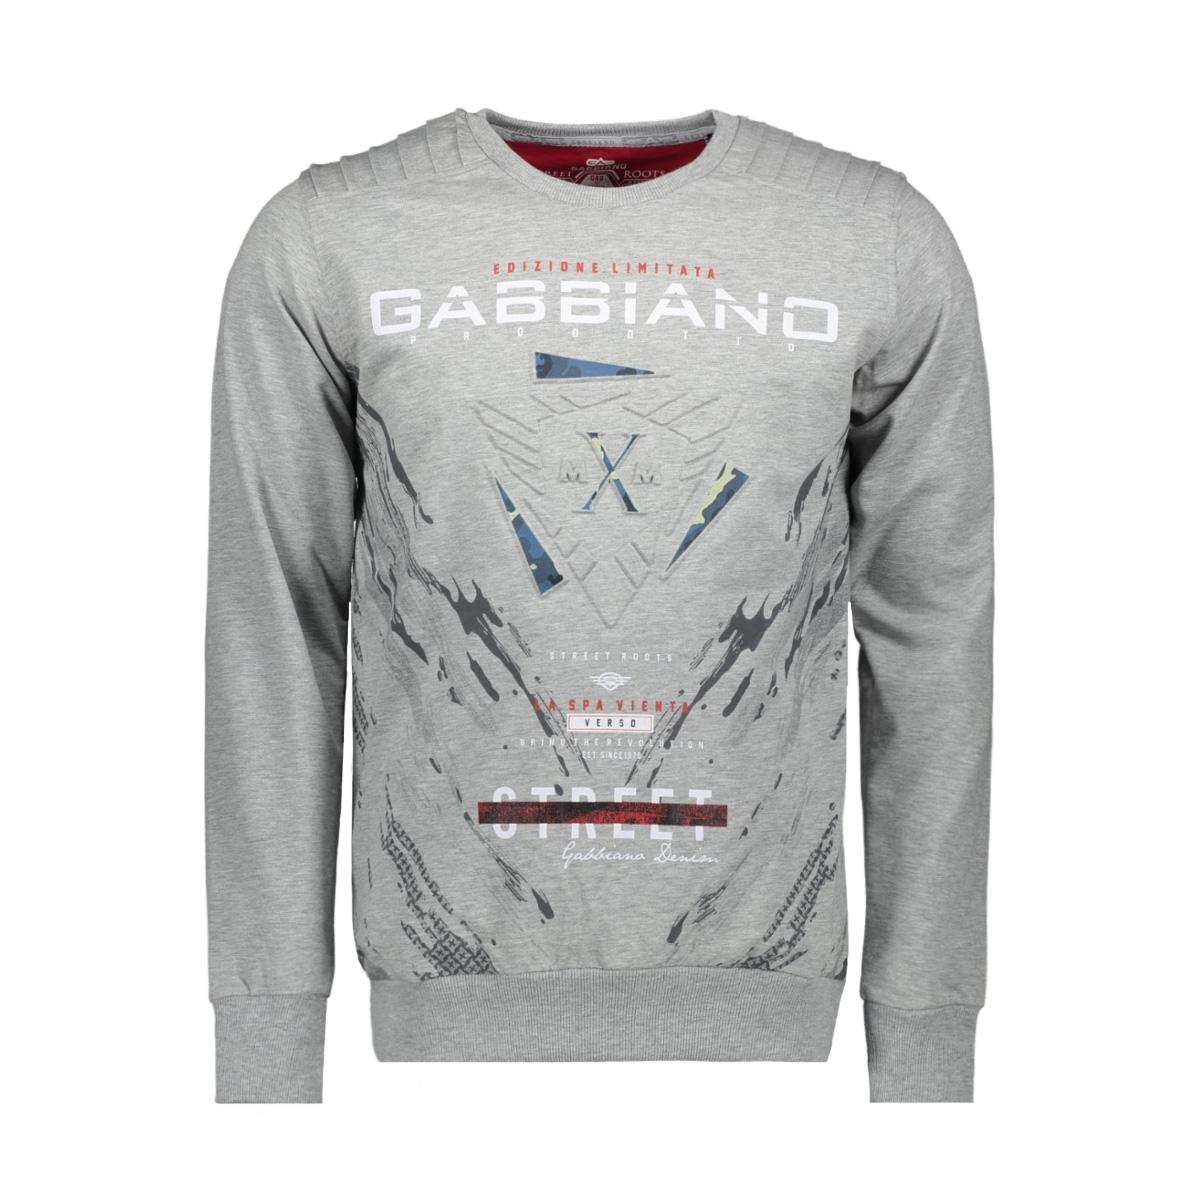 76105 gabbiano sweater grey